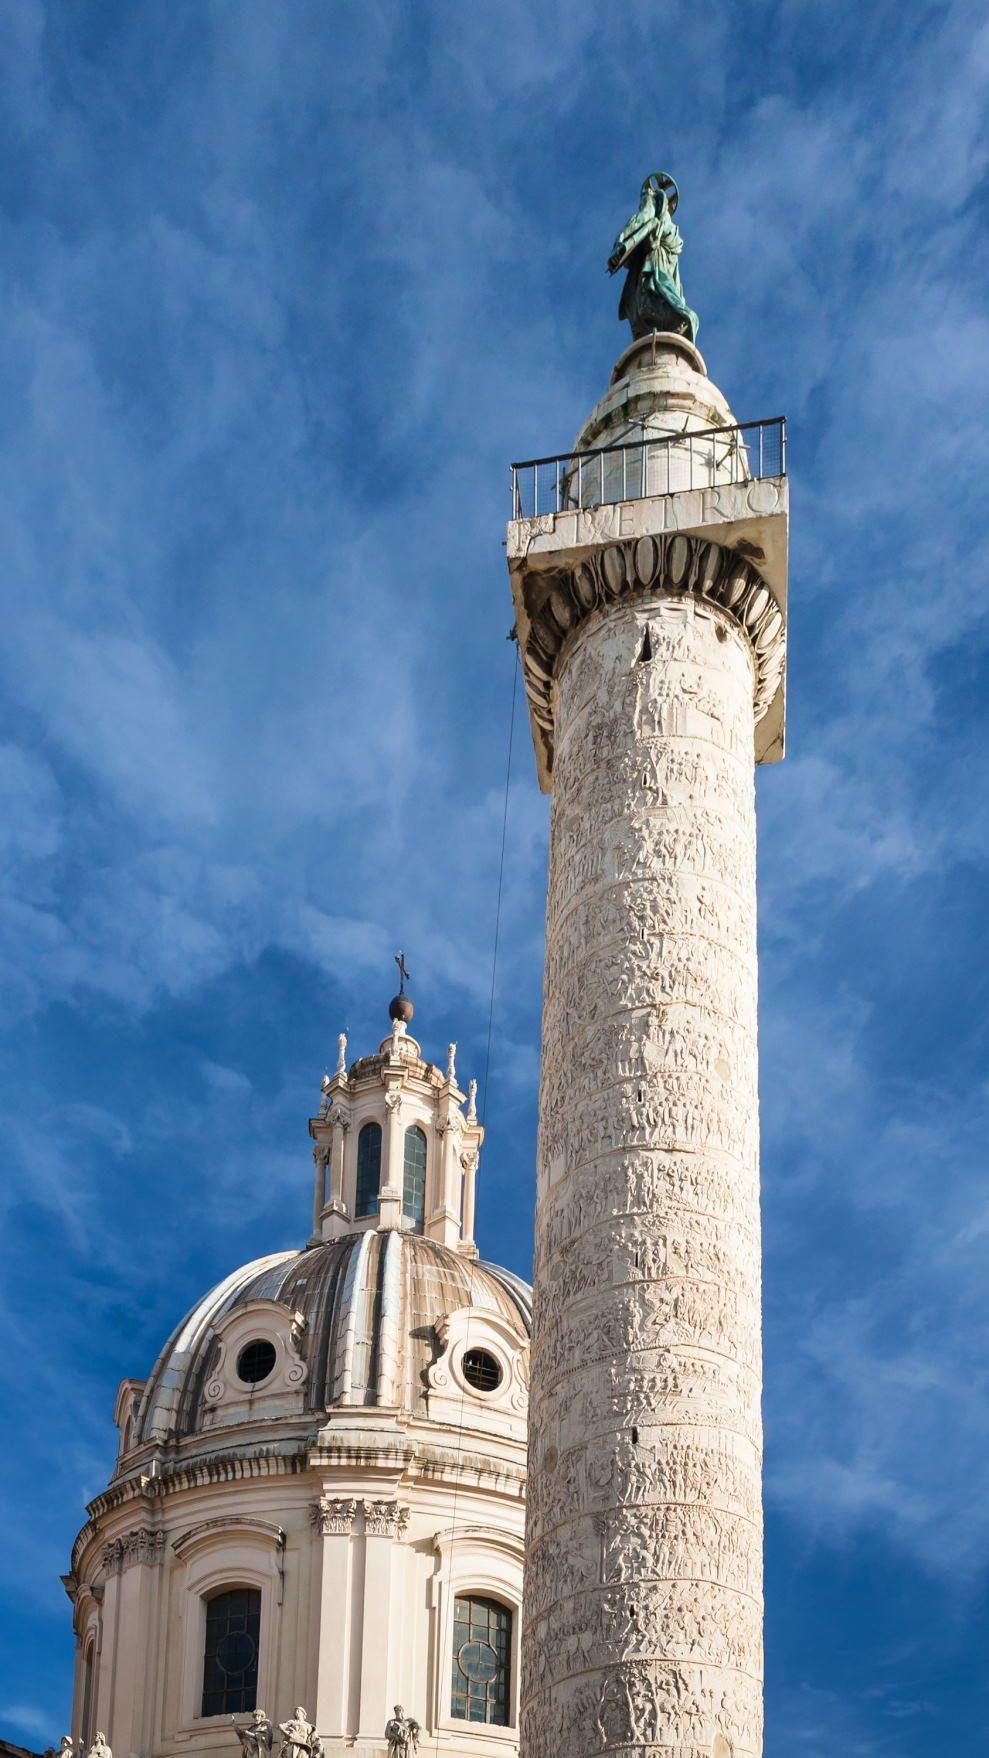 Trajans Column | Trajans Column; Rome, Italy. A Roman